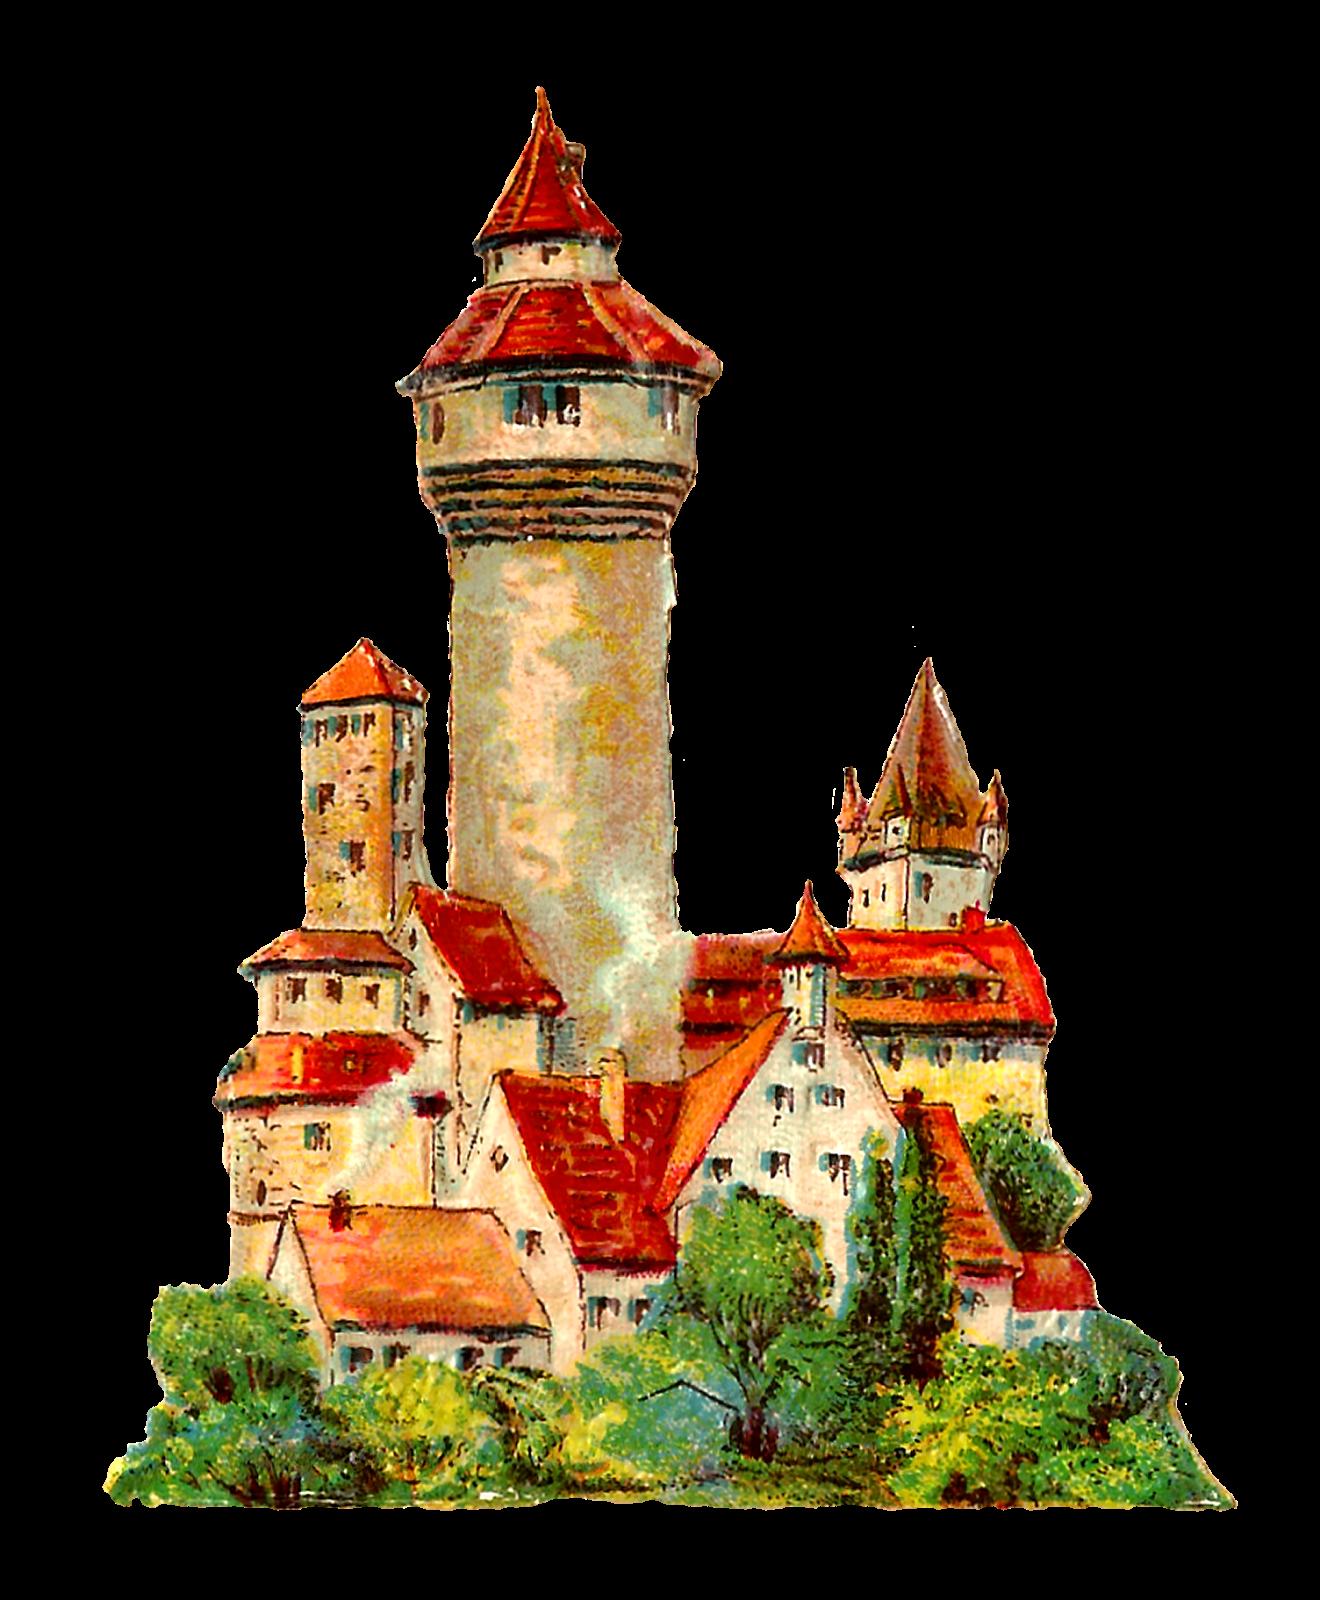 German house clipart clip royalty free download Antique Images: German Vintage Architecture Clip Art Illustrations ... clip royalty free download